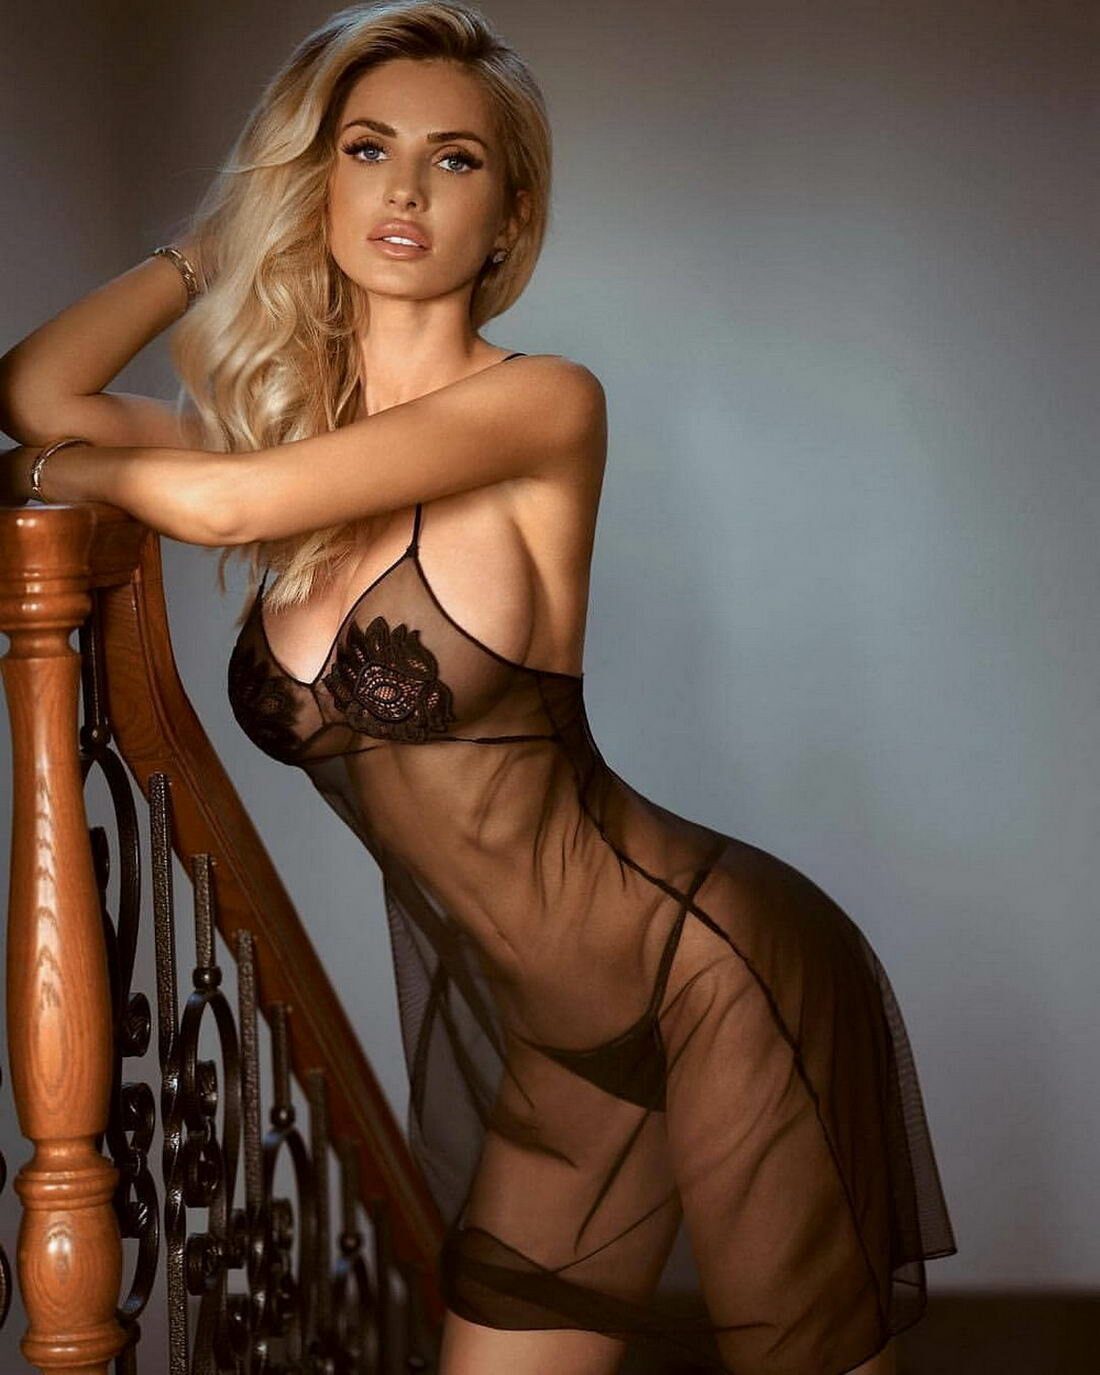 красавица картинки голая дойки